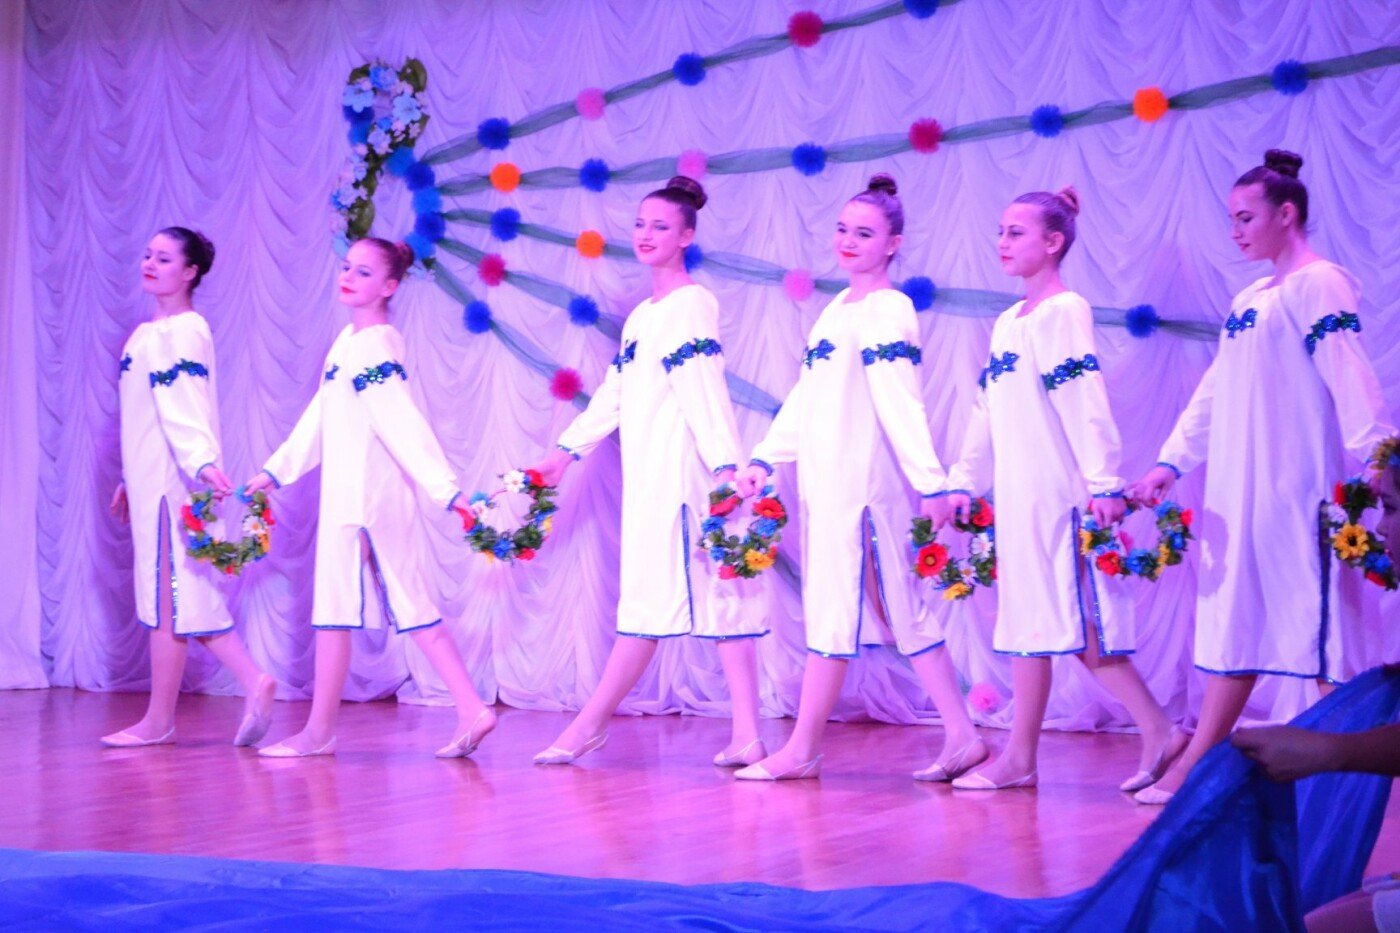 В селе Малодолинское поздравили женщин с 8 Марта, фото-4